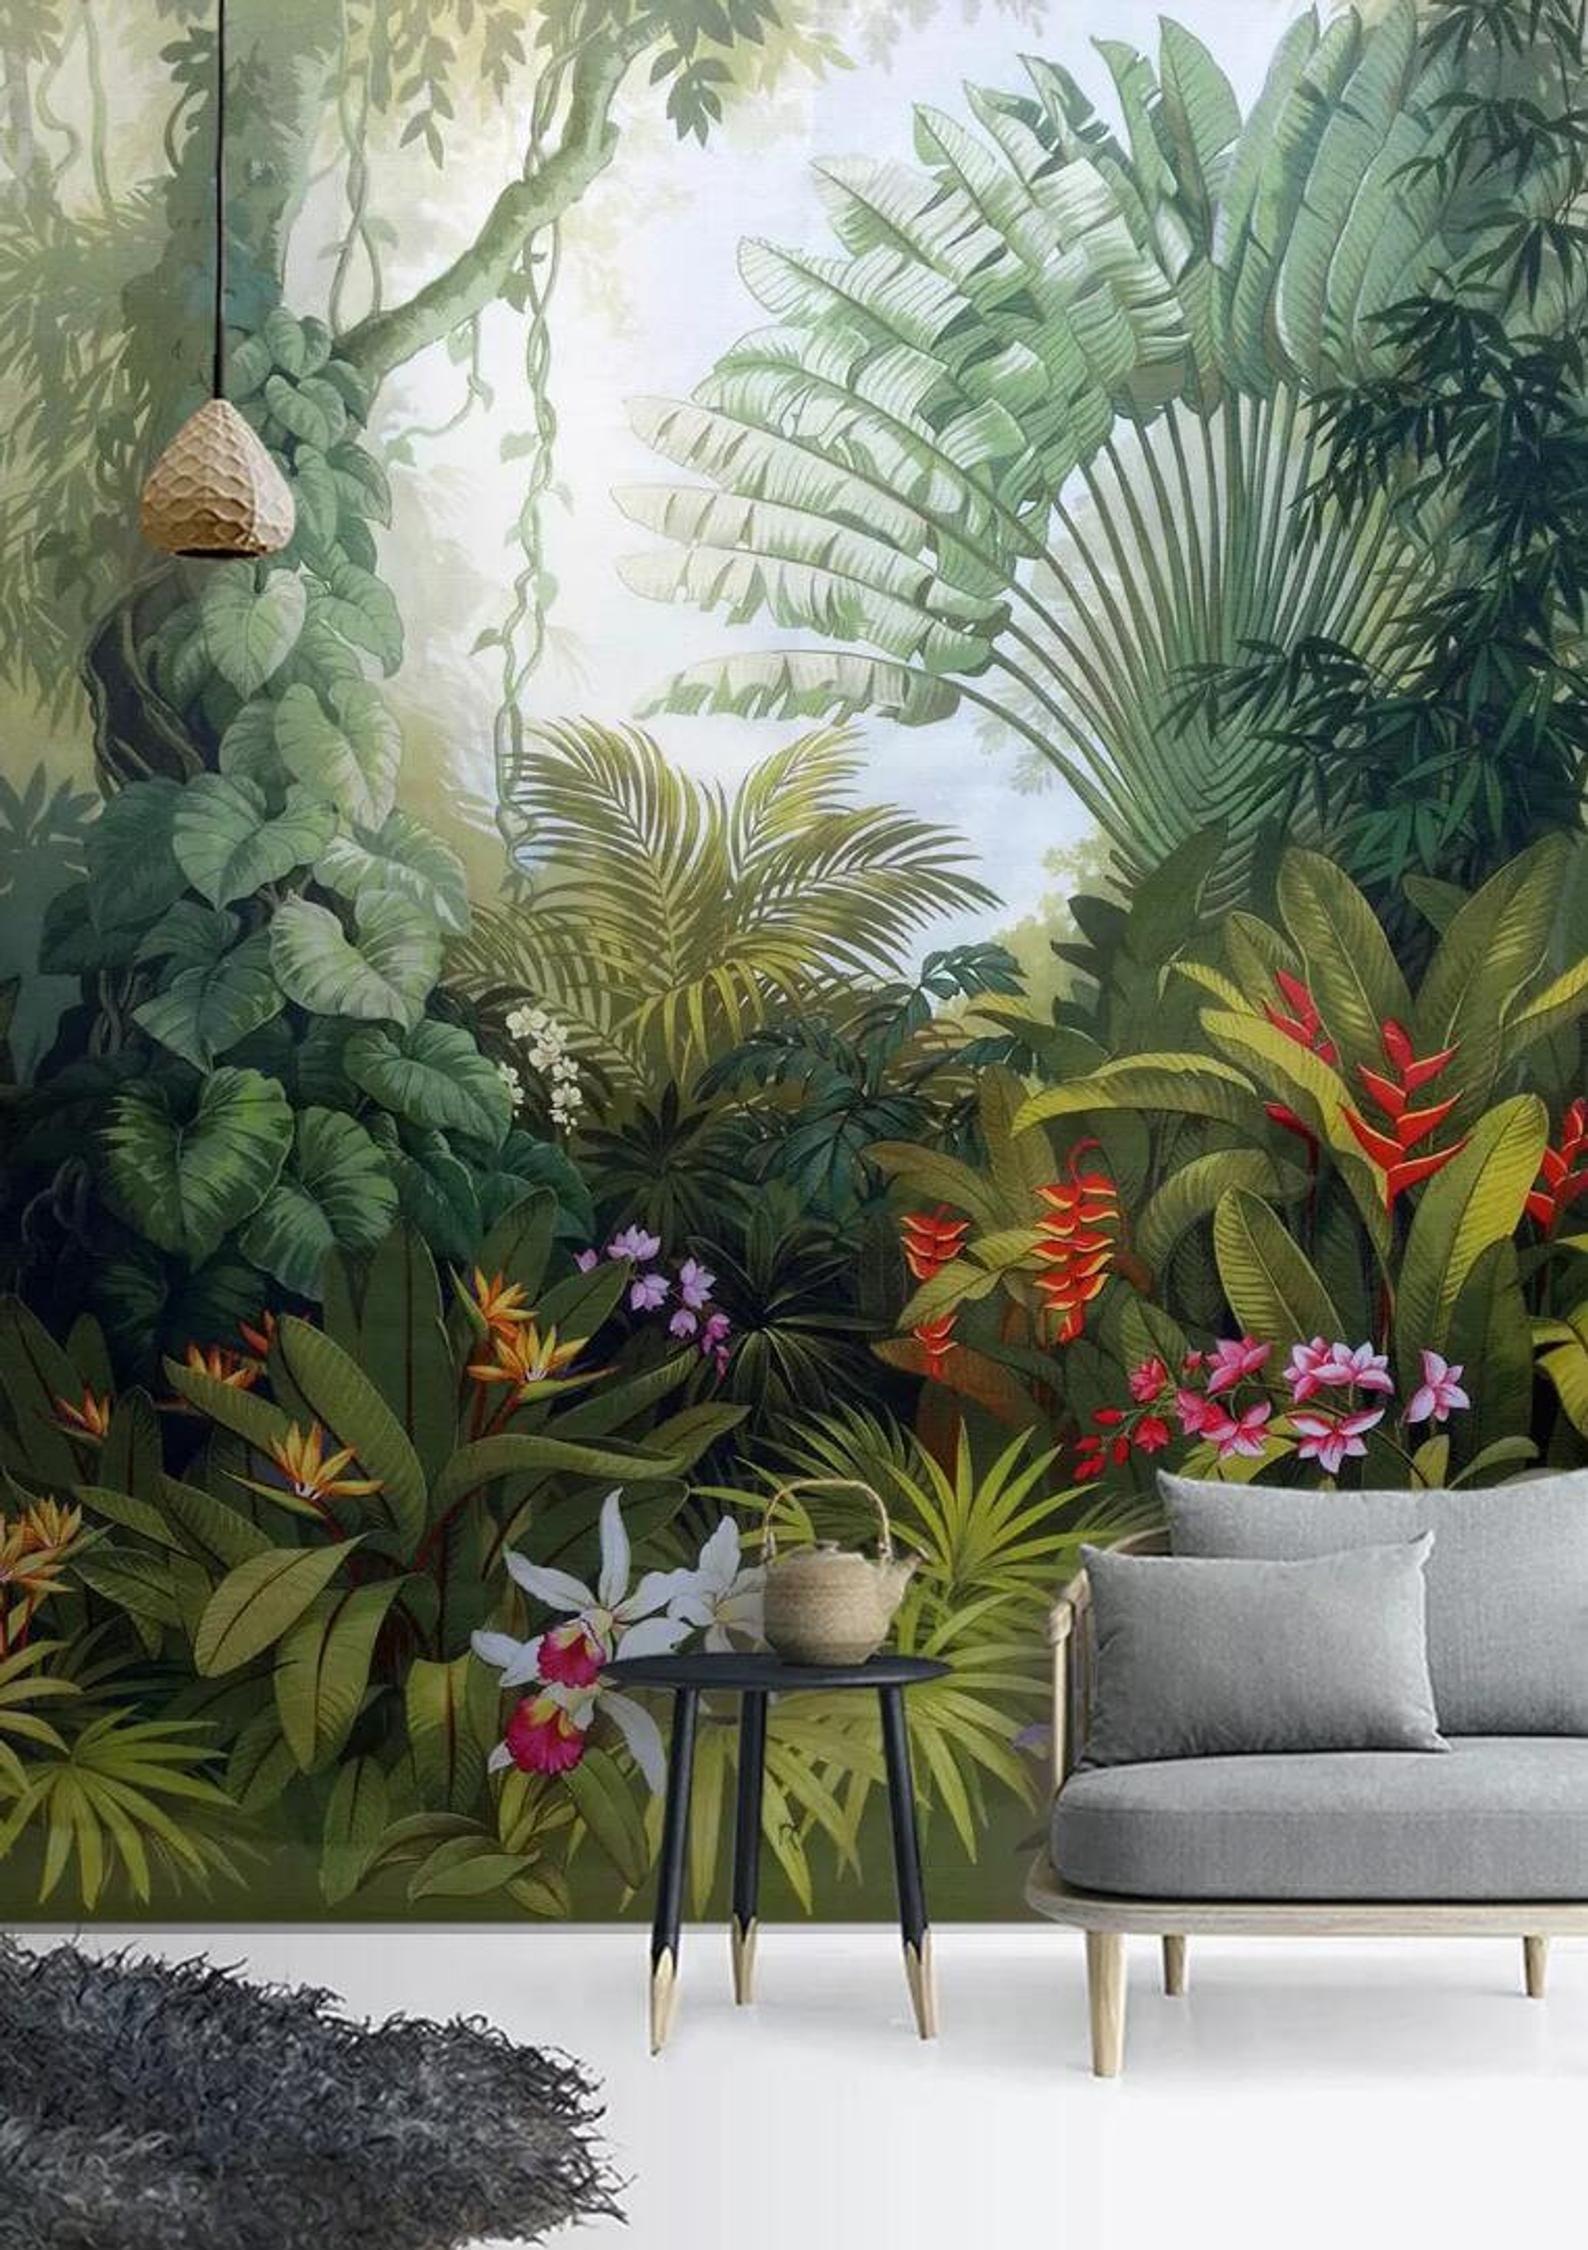 3d Tropical Rainforest Lush Vegetation Palm Leaves Etsy Tropical Decor Palm Leaf Wallpaper Leaf Wallpaper